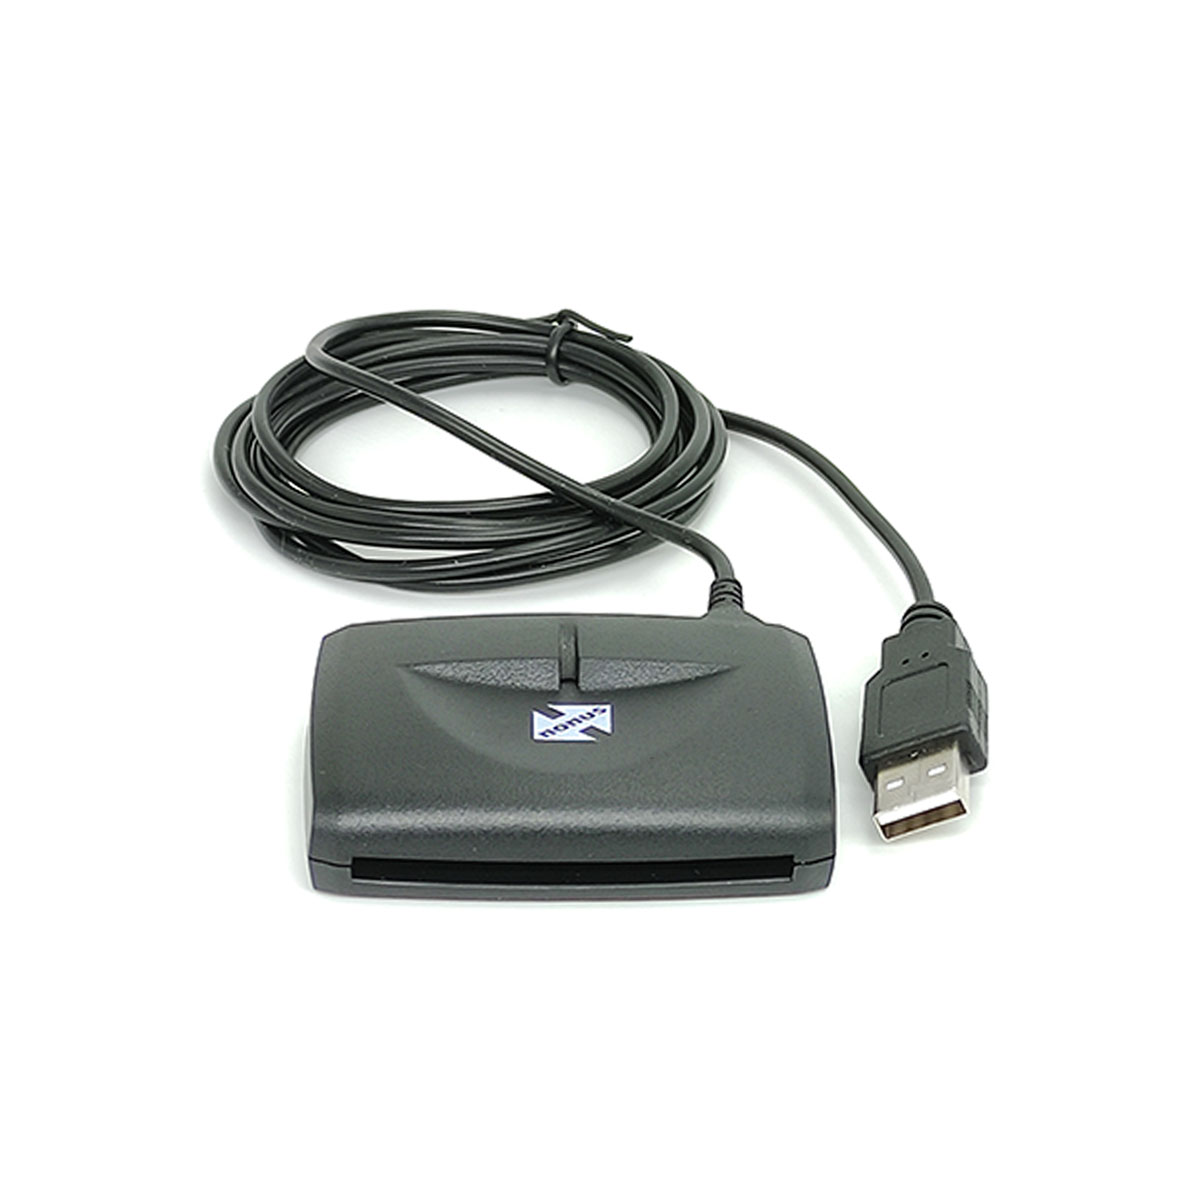 Leitor e Gravador Smartcard Nonus Smartnonus, USB 2.0